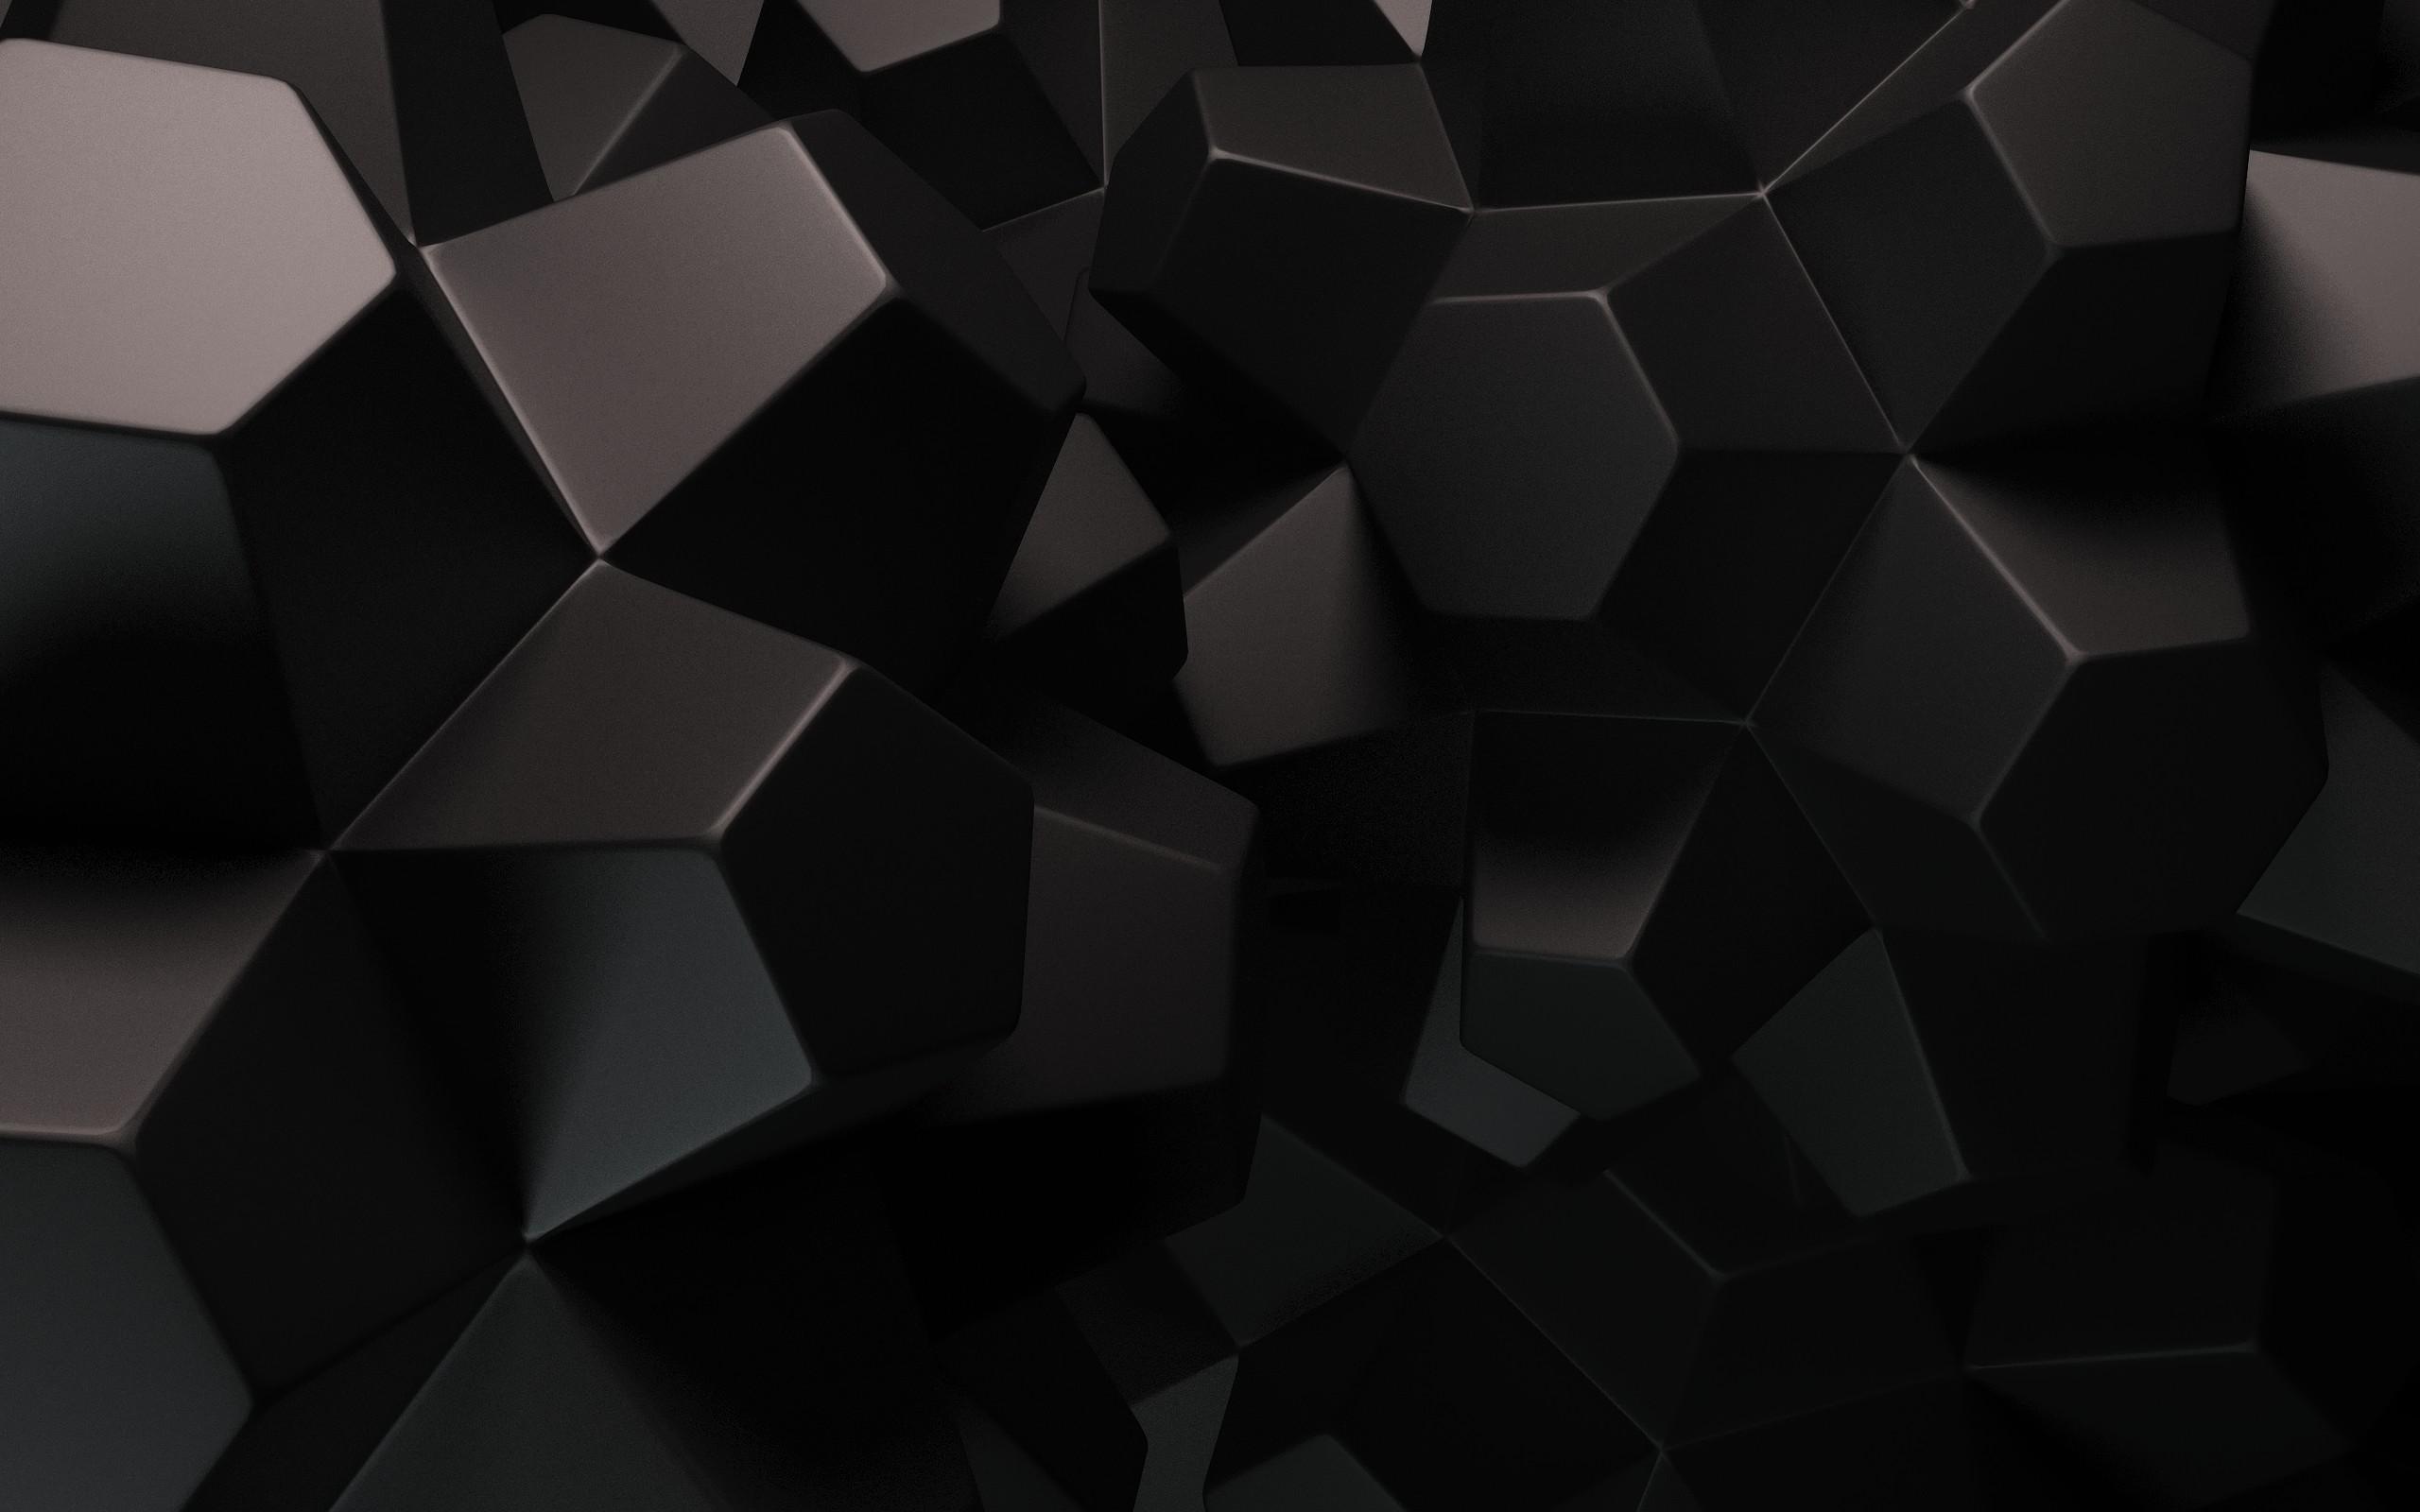 Geometric Shapes 3D Mac wallpaper